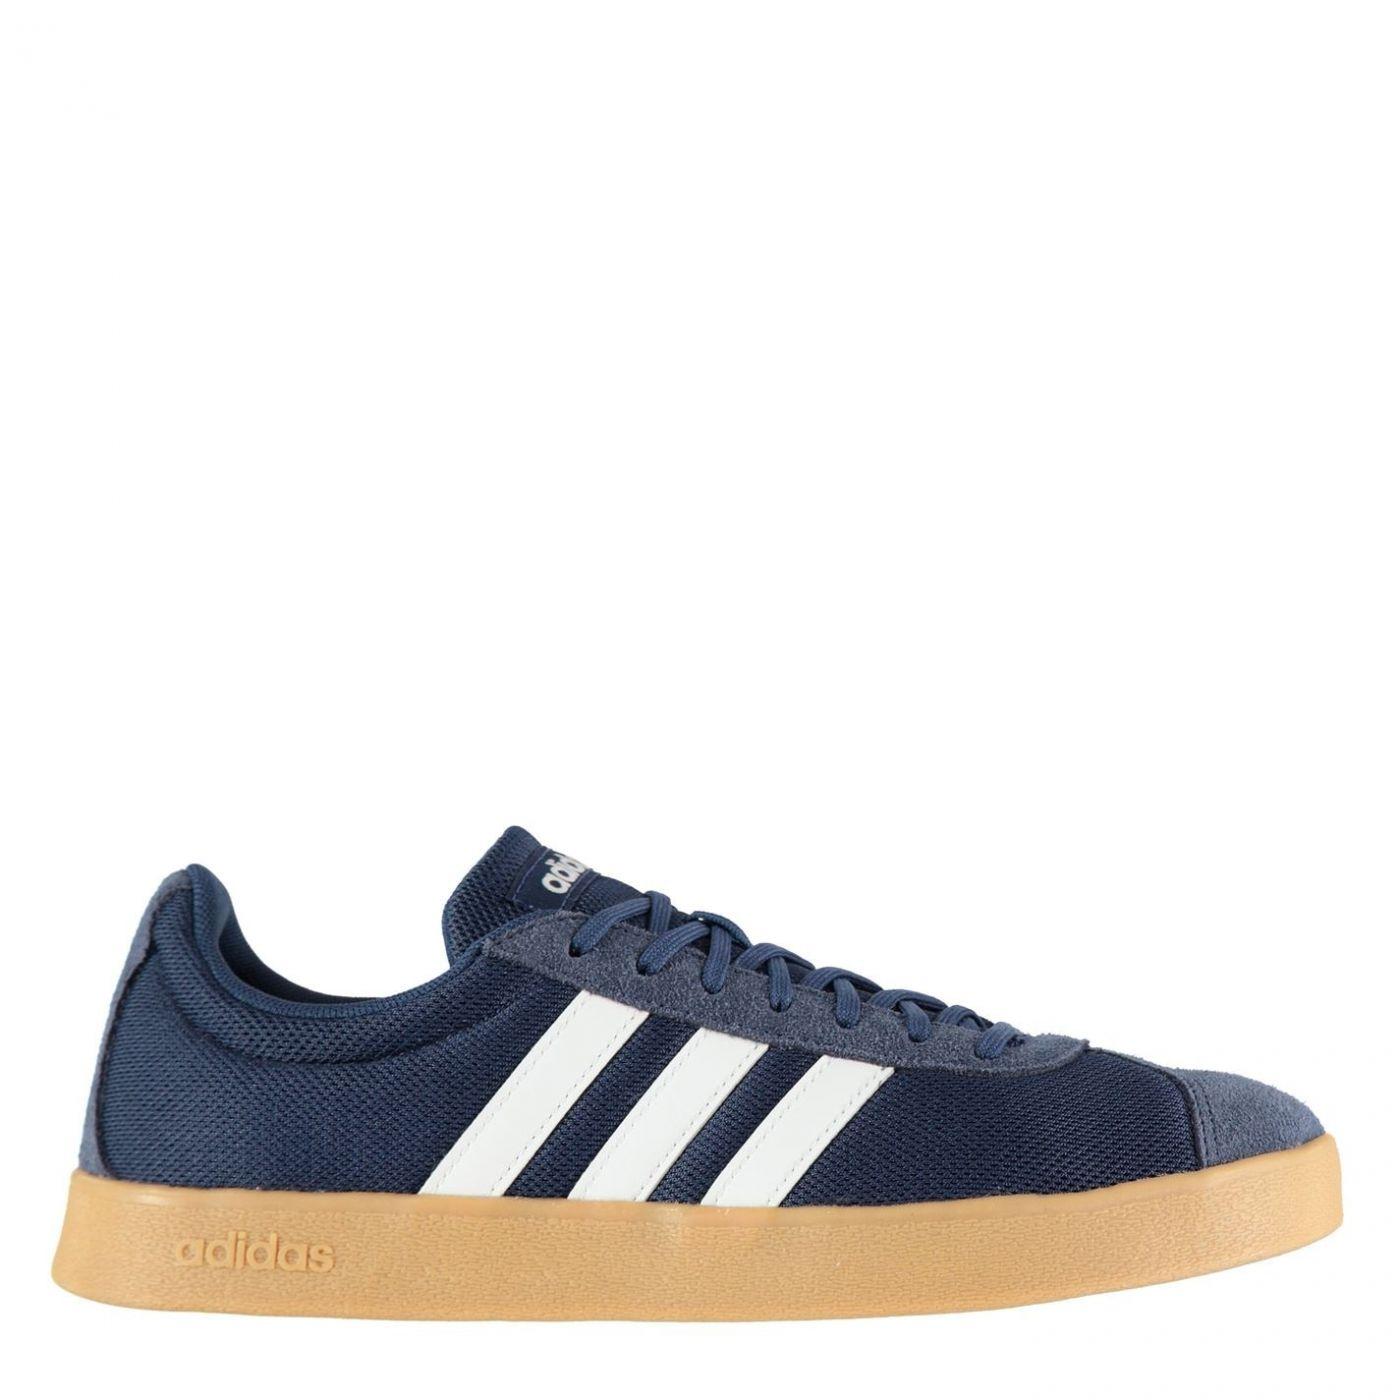 Adidas VL Court Mesh Mens Trainers